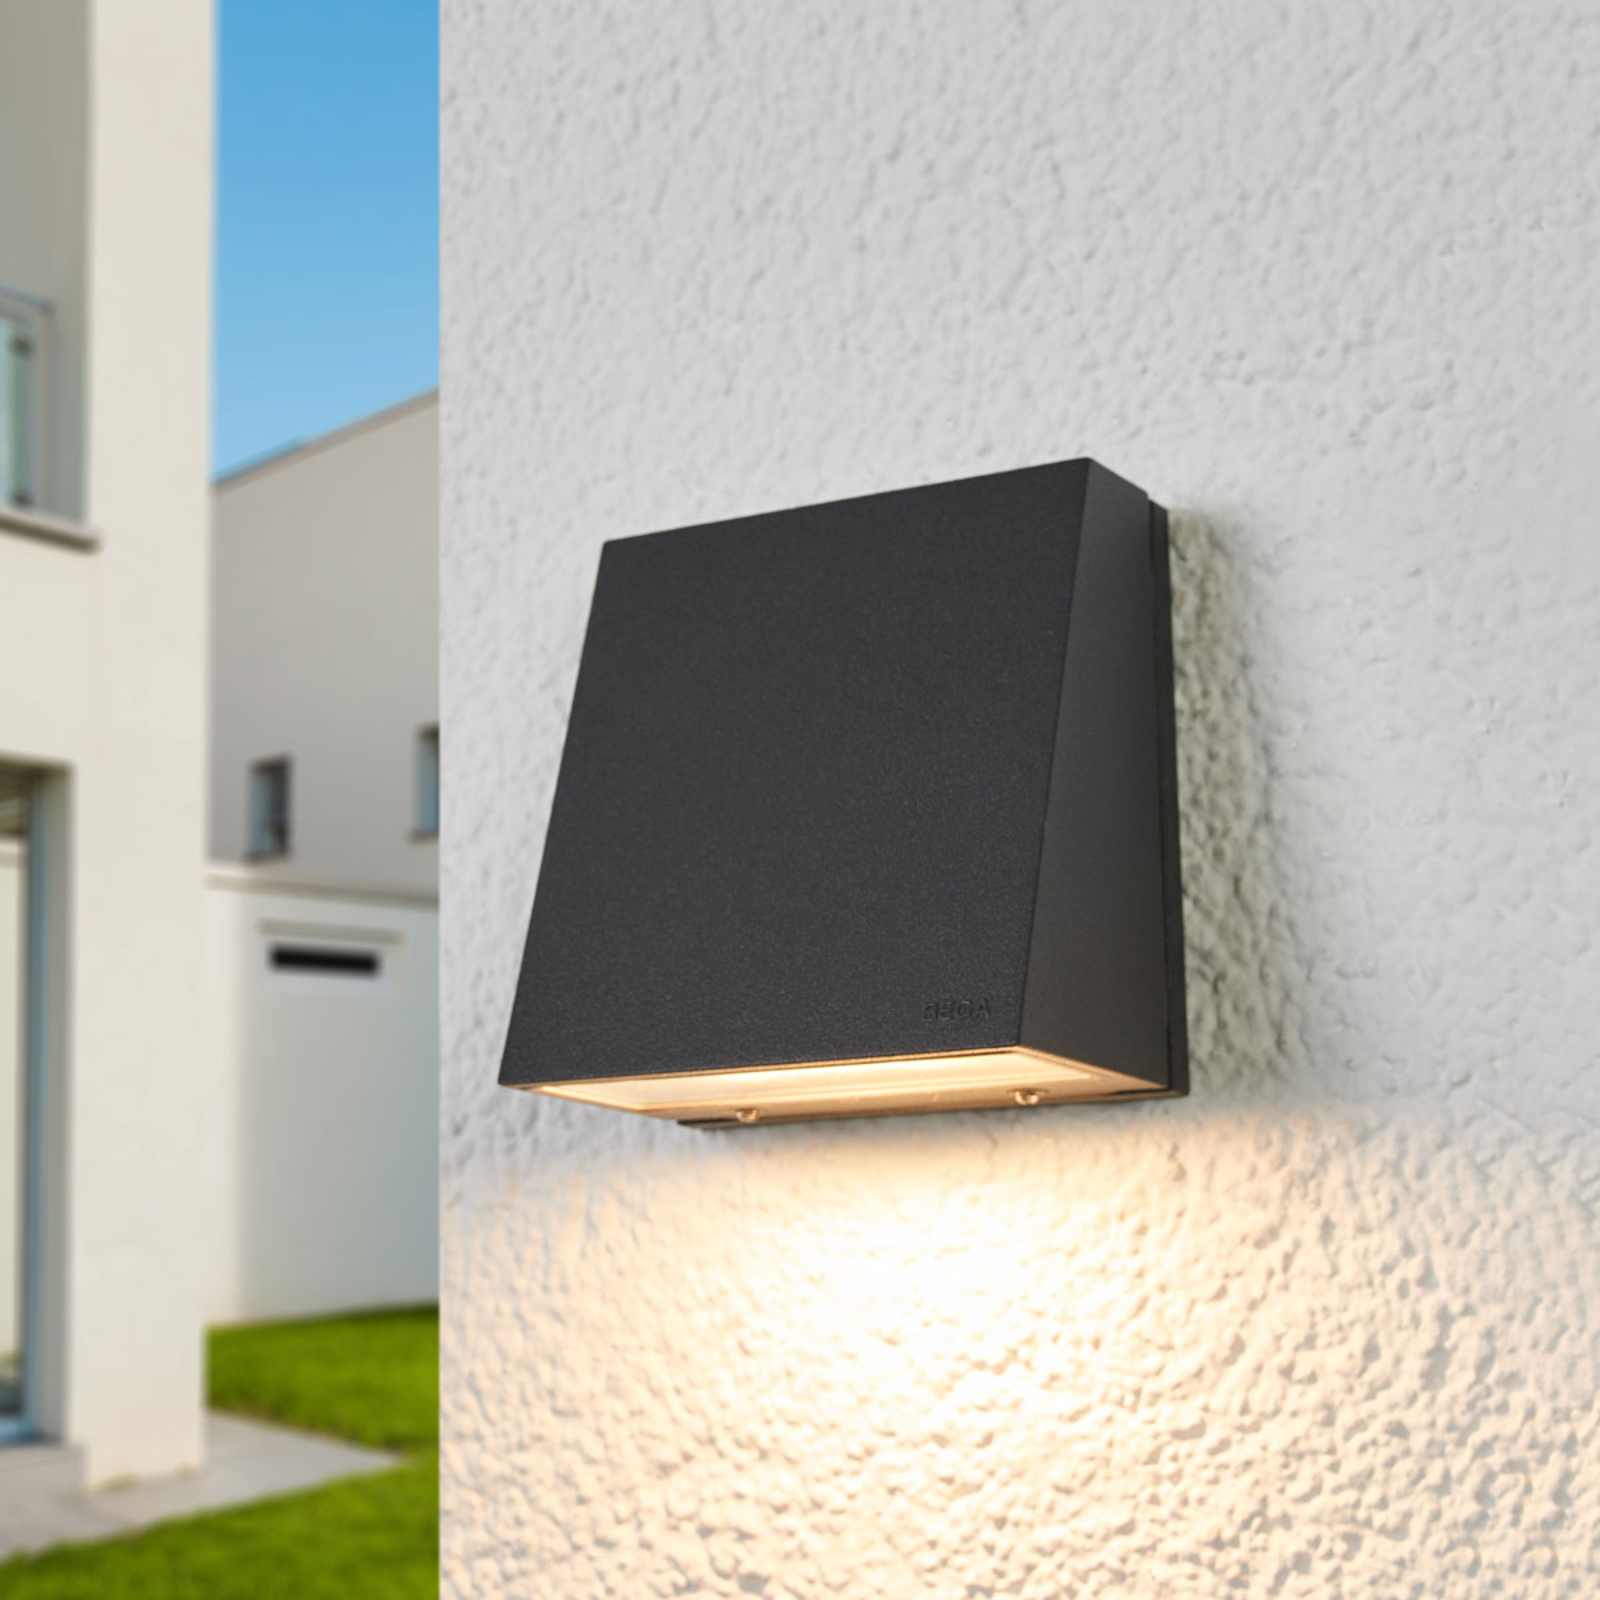 BEGA 22215K3 outdoor wall lamp graphite 3,000K 9cm_1566016_1